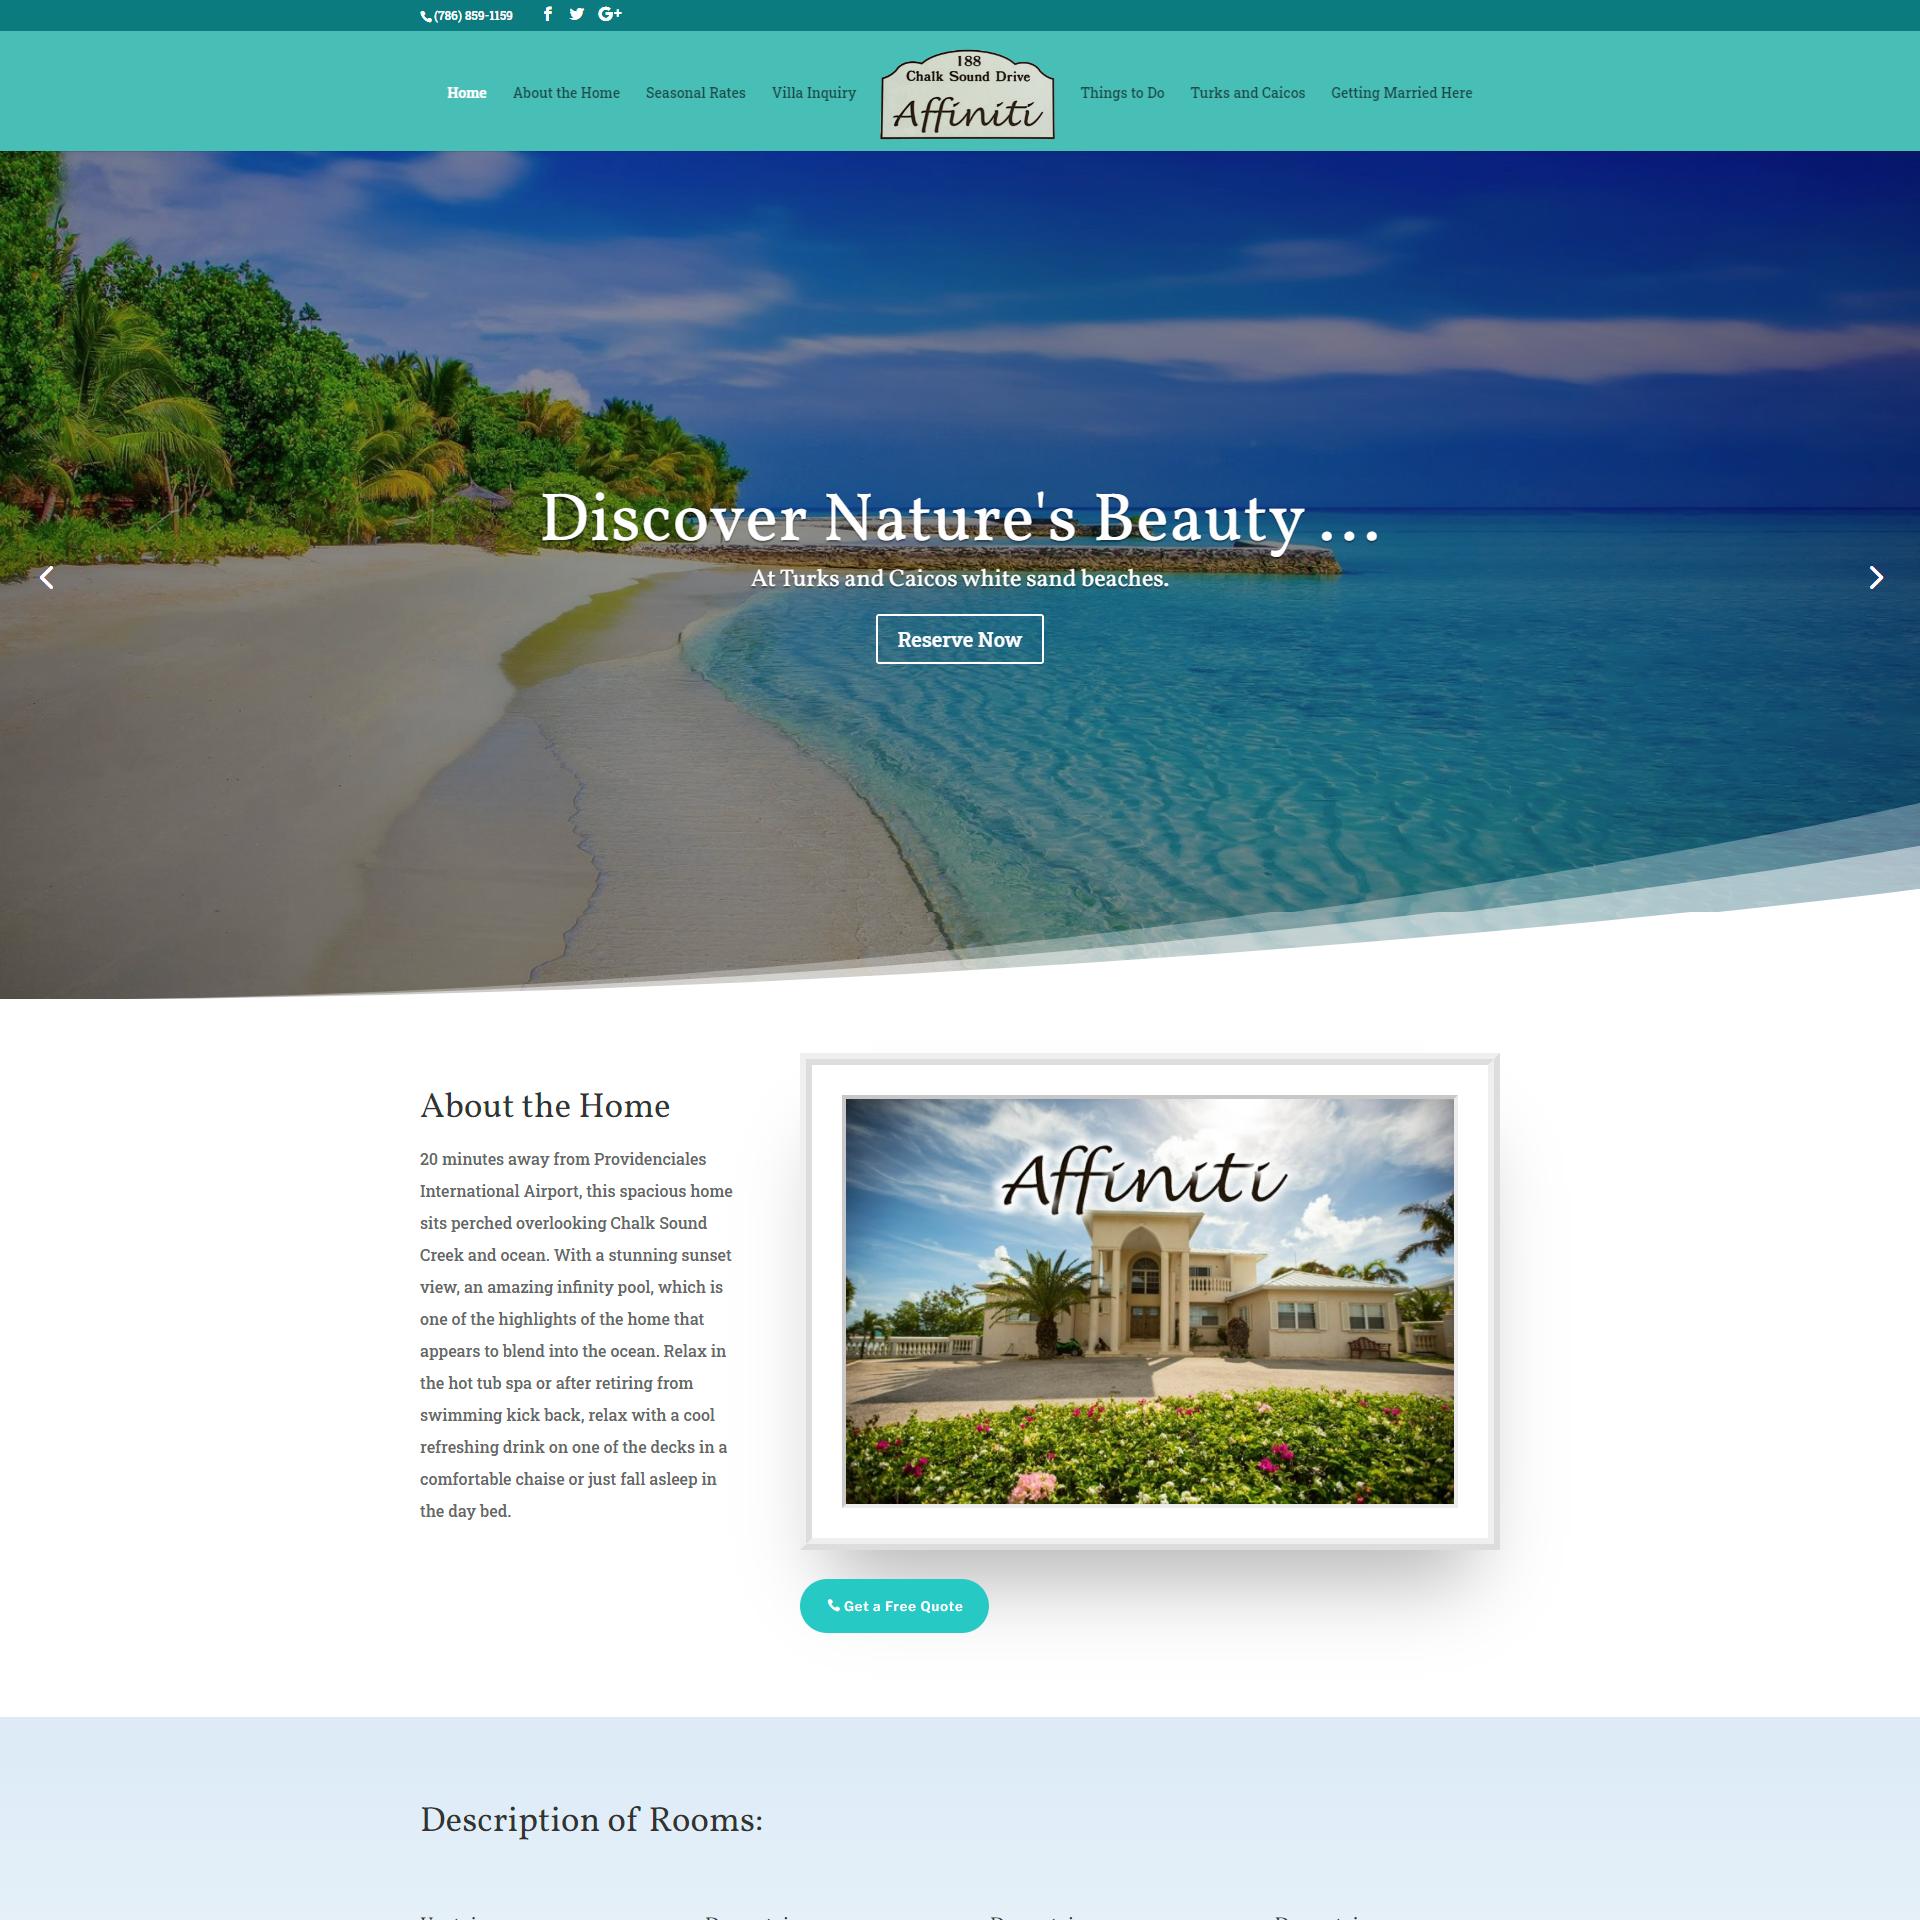 Villa Affiniti Turks and Caicos Website Design and Development